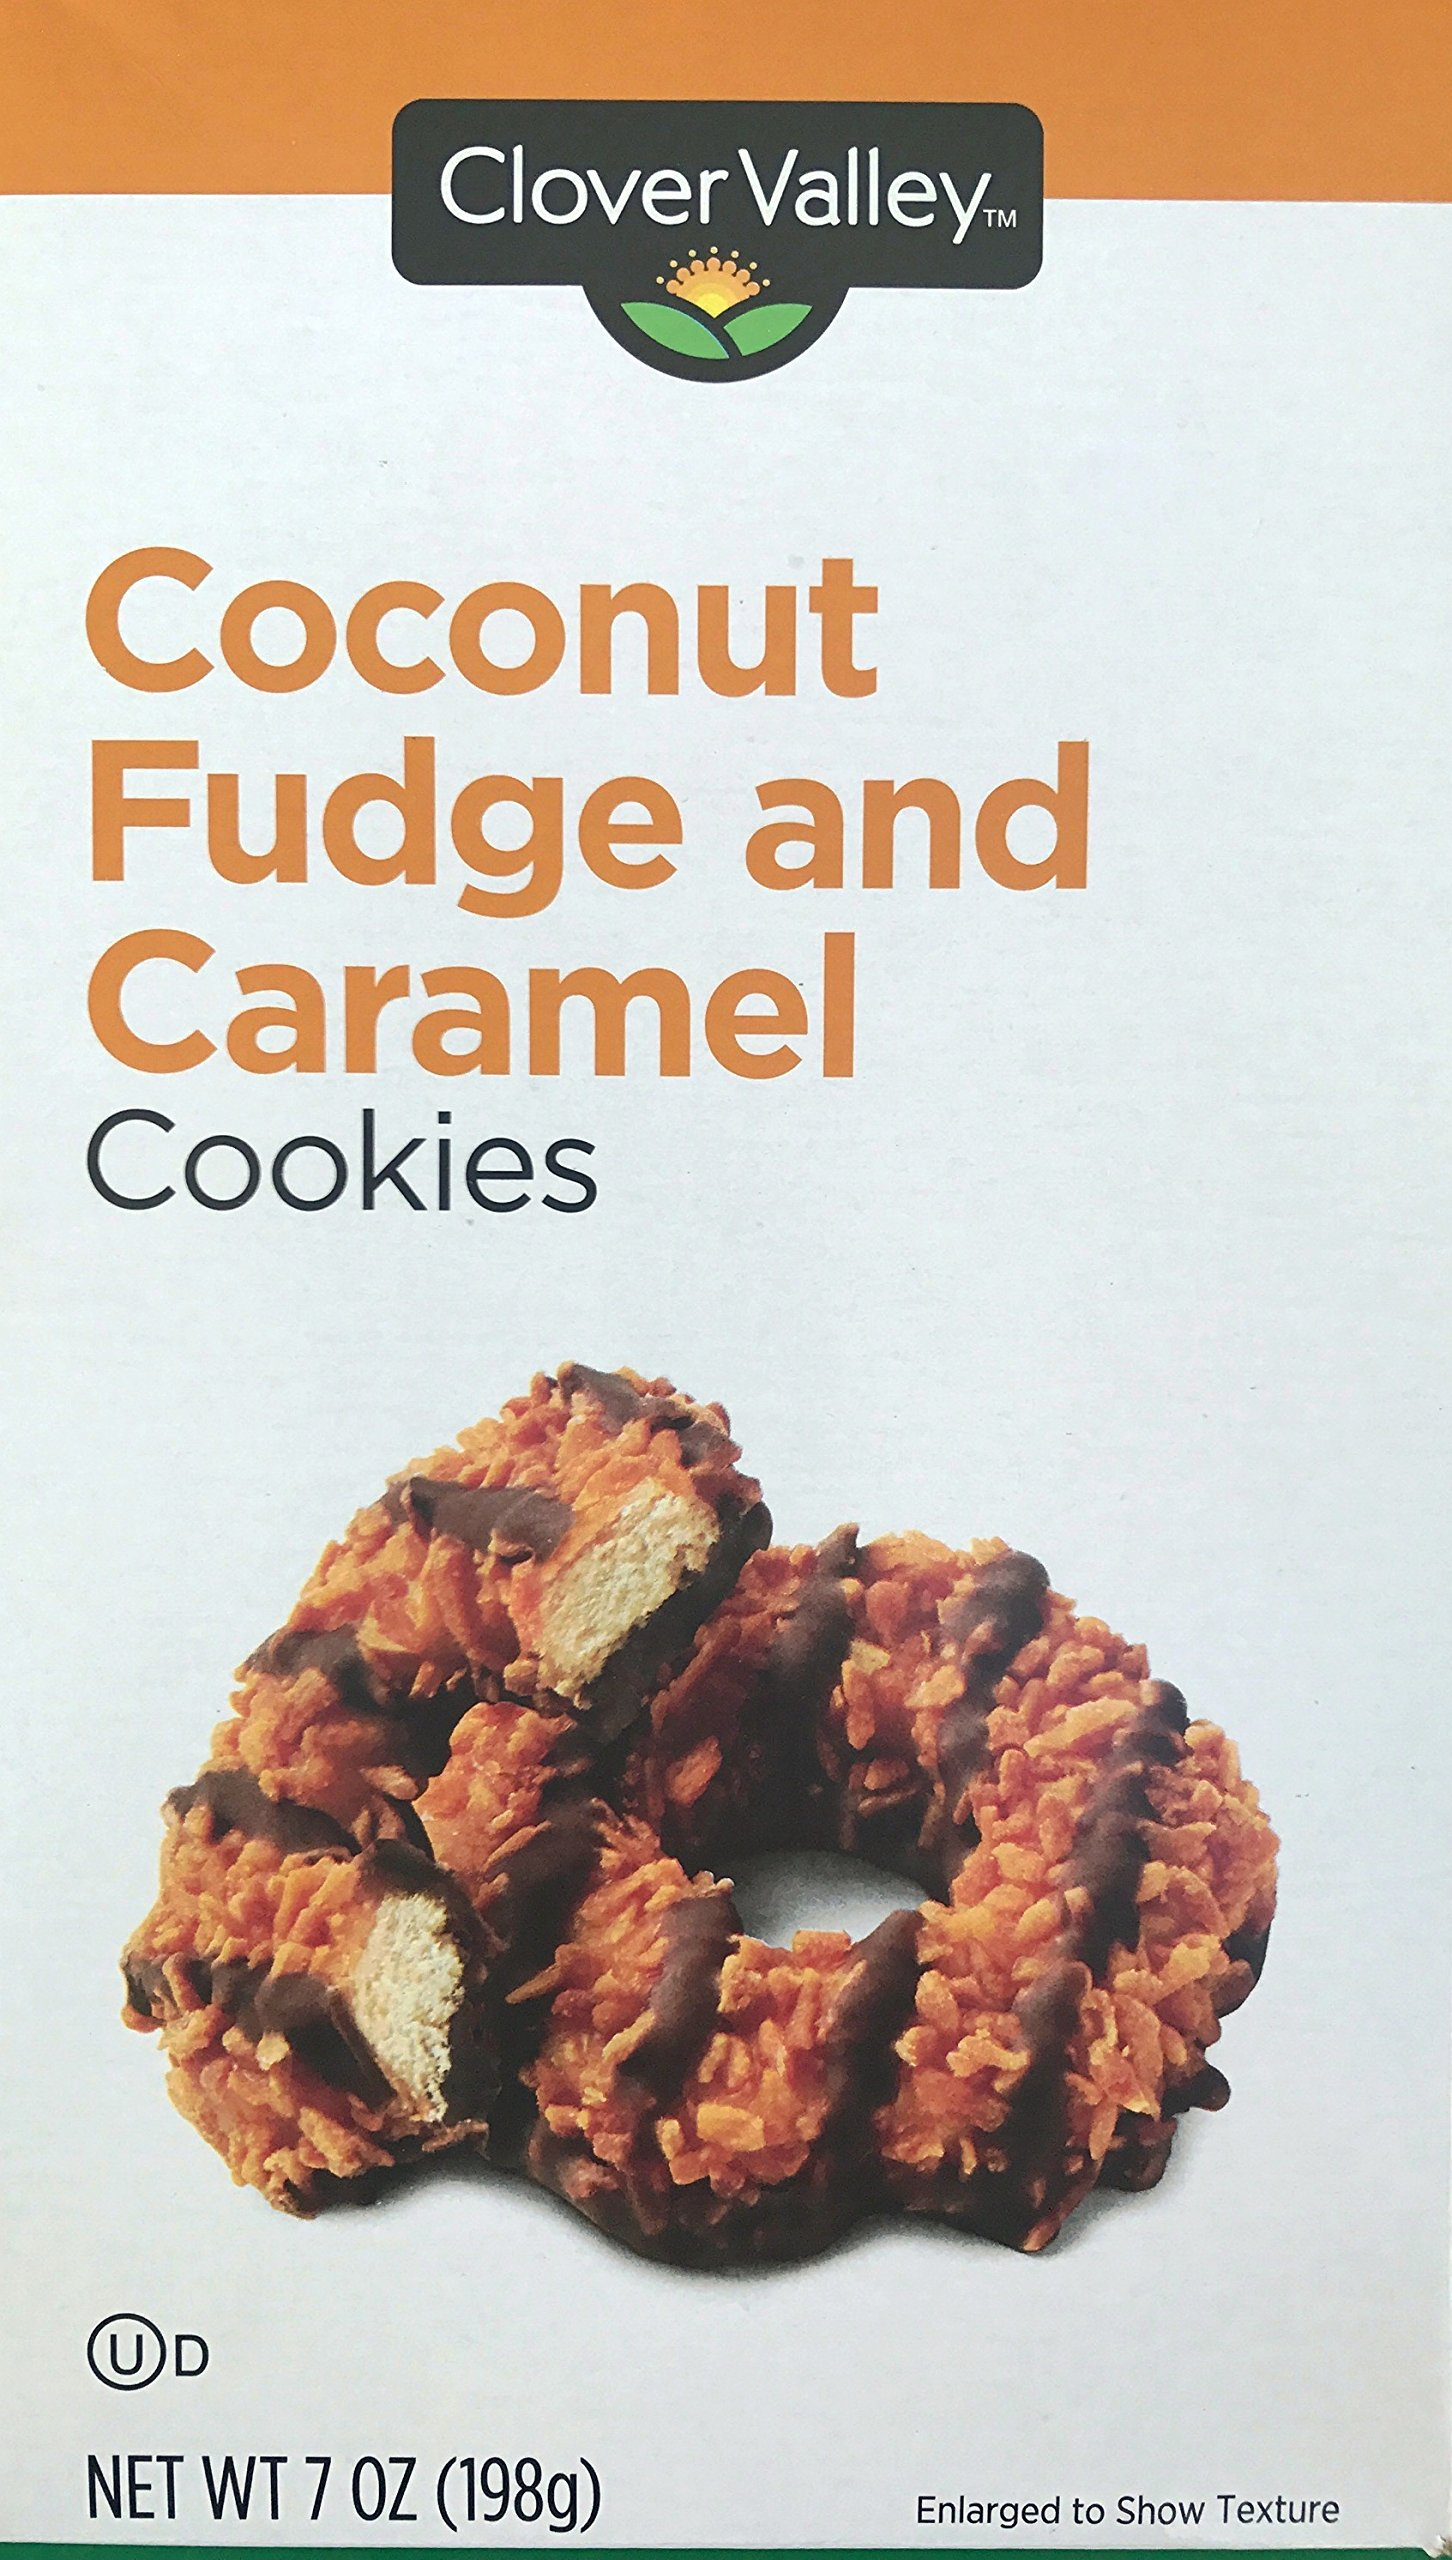 Coconut Fudge and Caramel Cookies 7oz. Just Like Samoas